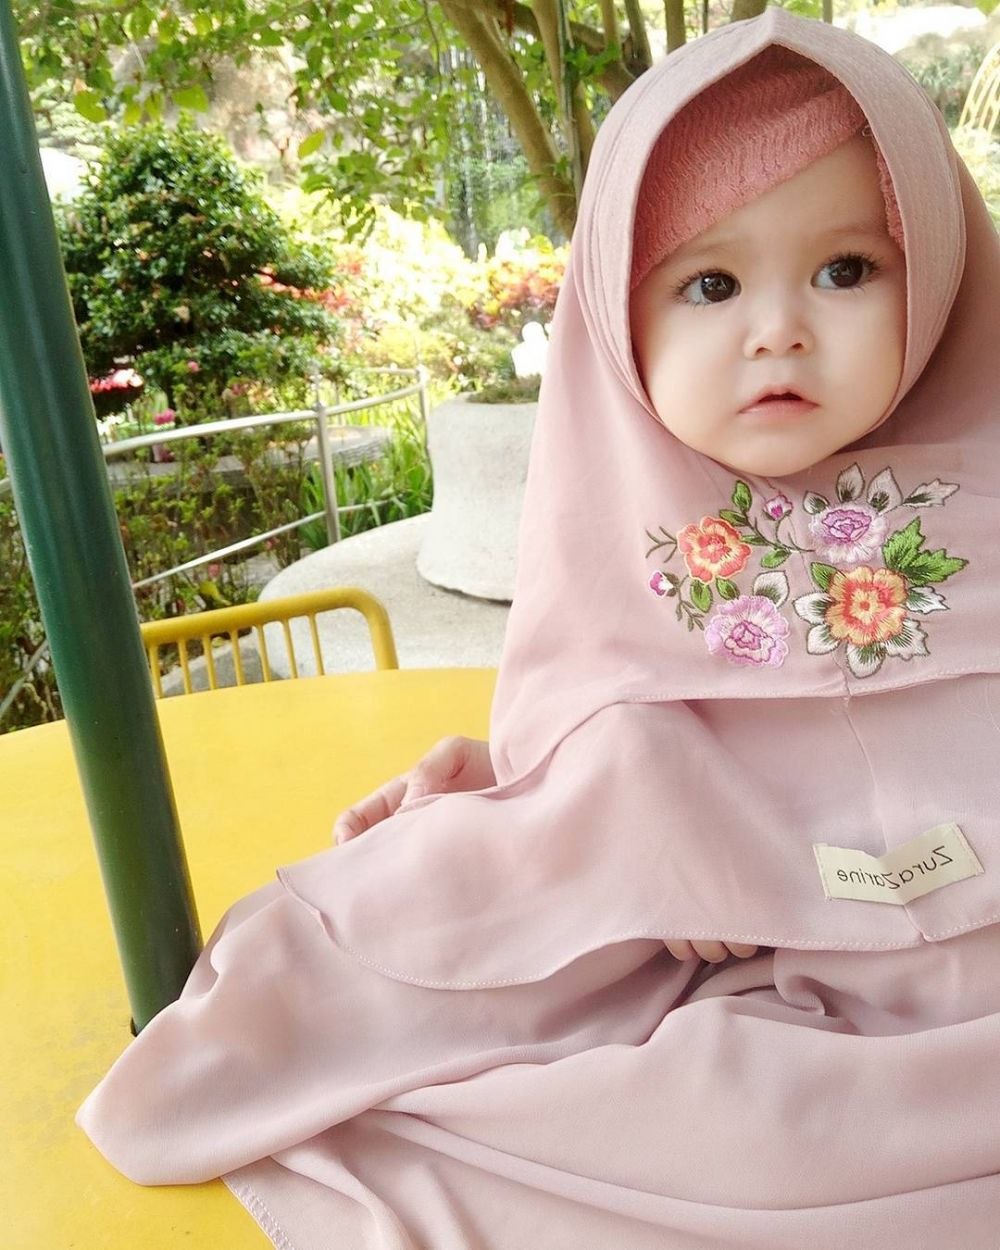 12 Potret Lucu Naura Alaydrus Bayi 1 Tahun Yang Hits Dengan Hija